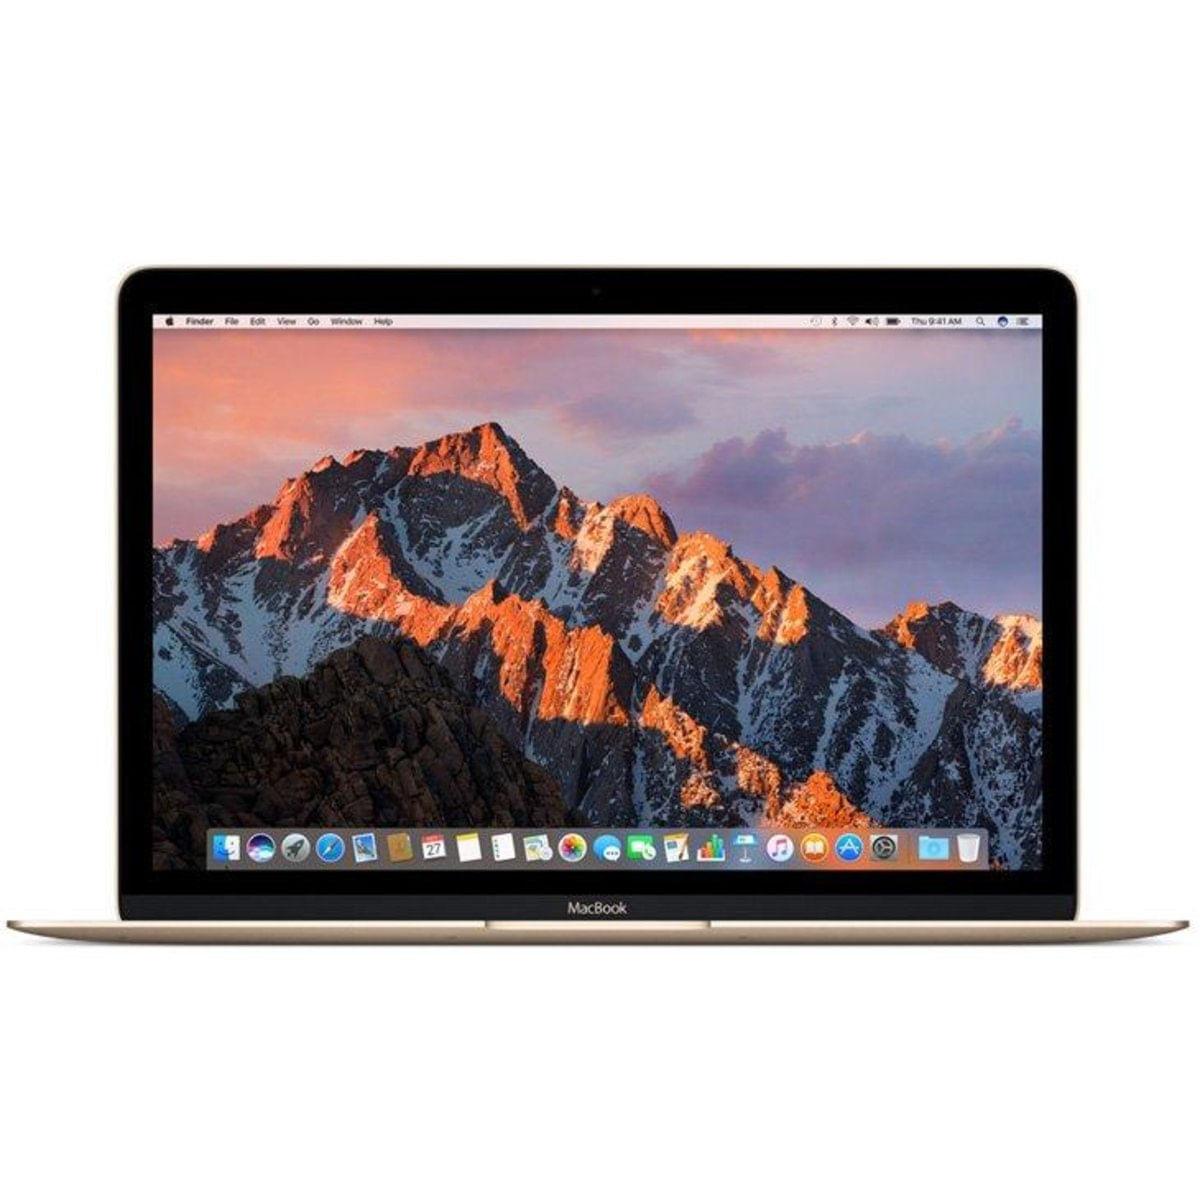 Macbook - Apple Mnyl2bz/a I5 1.30ghz 8gb 512gb Ssd Intel Hd Graphics 615 Macos Sierra Retina 12'' Polegadas